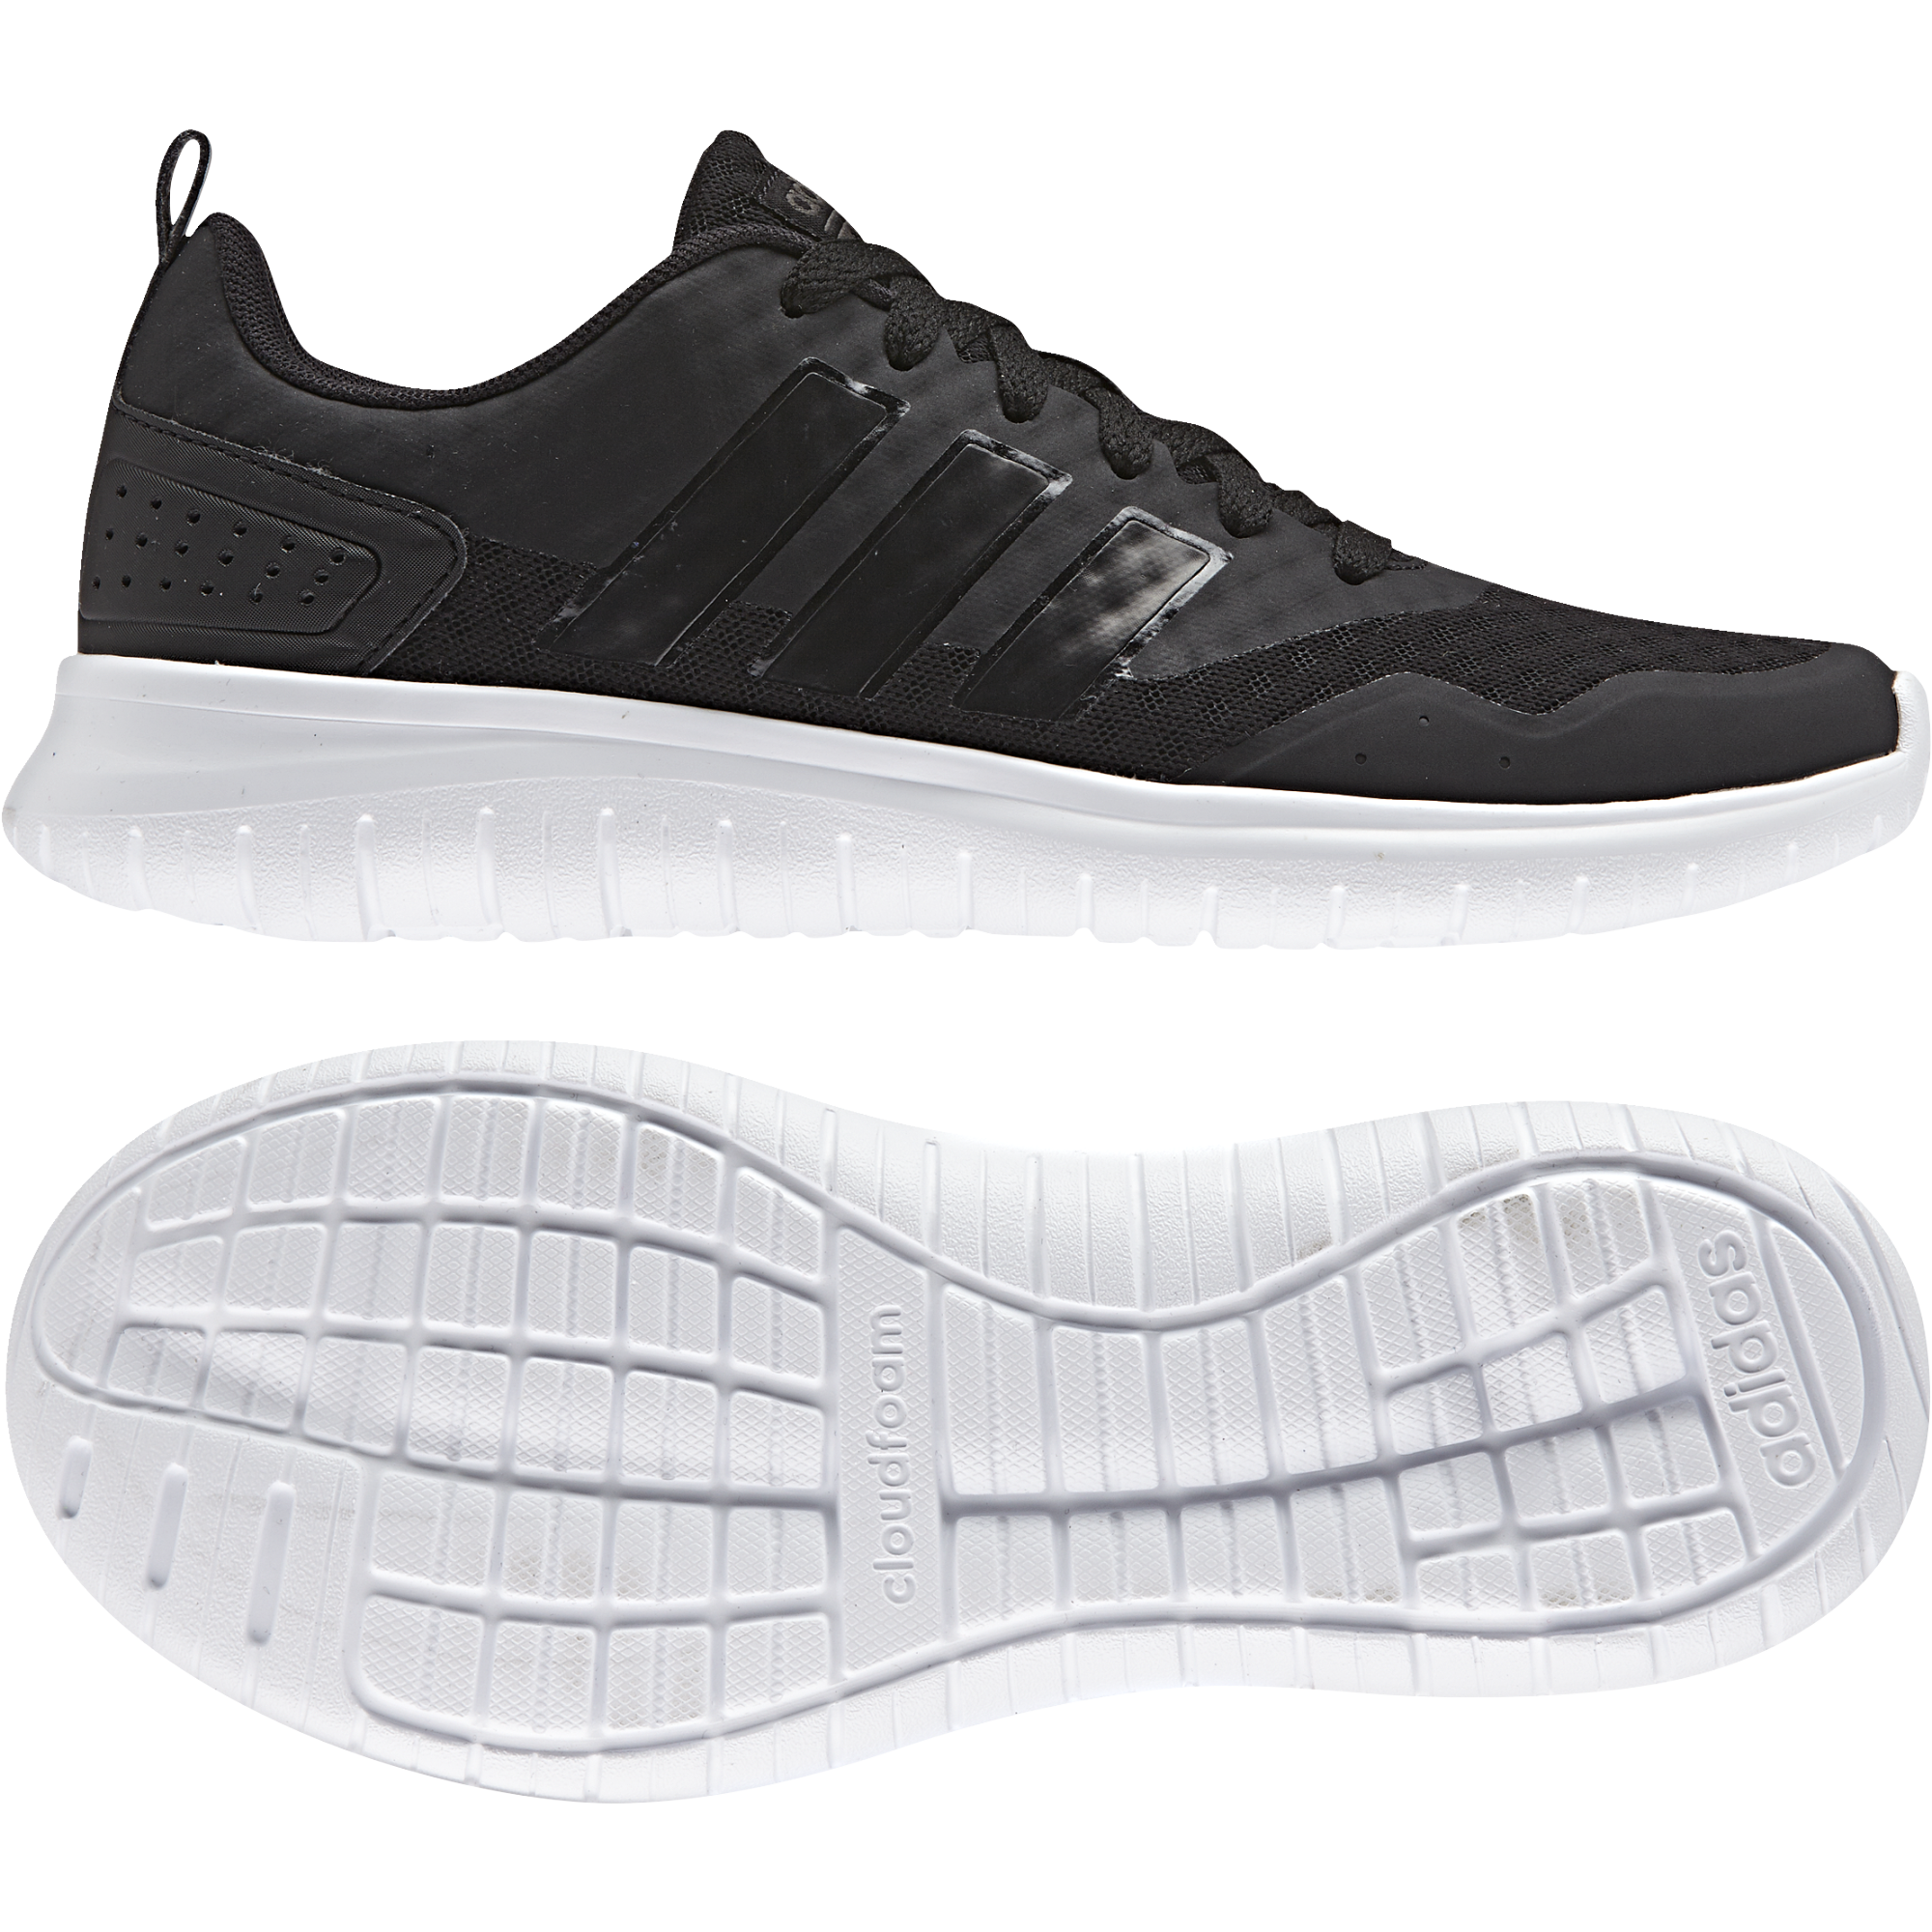 Adidas Cloudfoam Lite Flex női futócipő  007abd794a